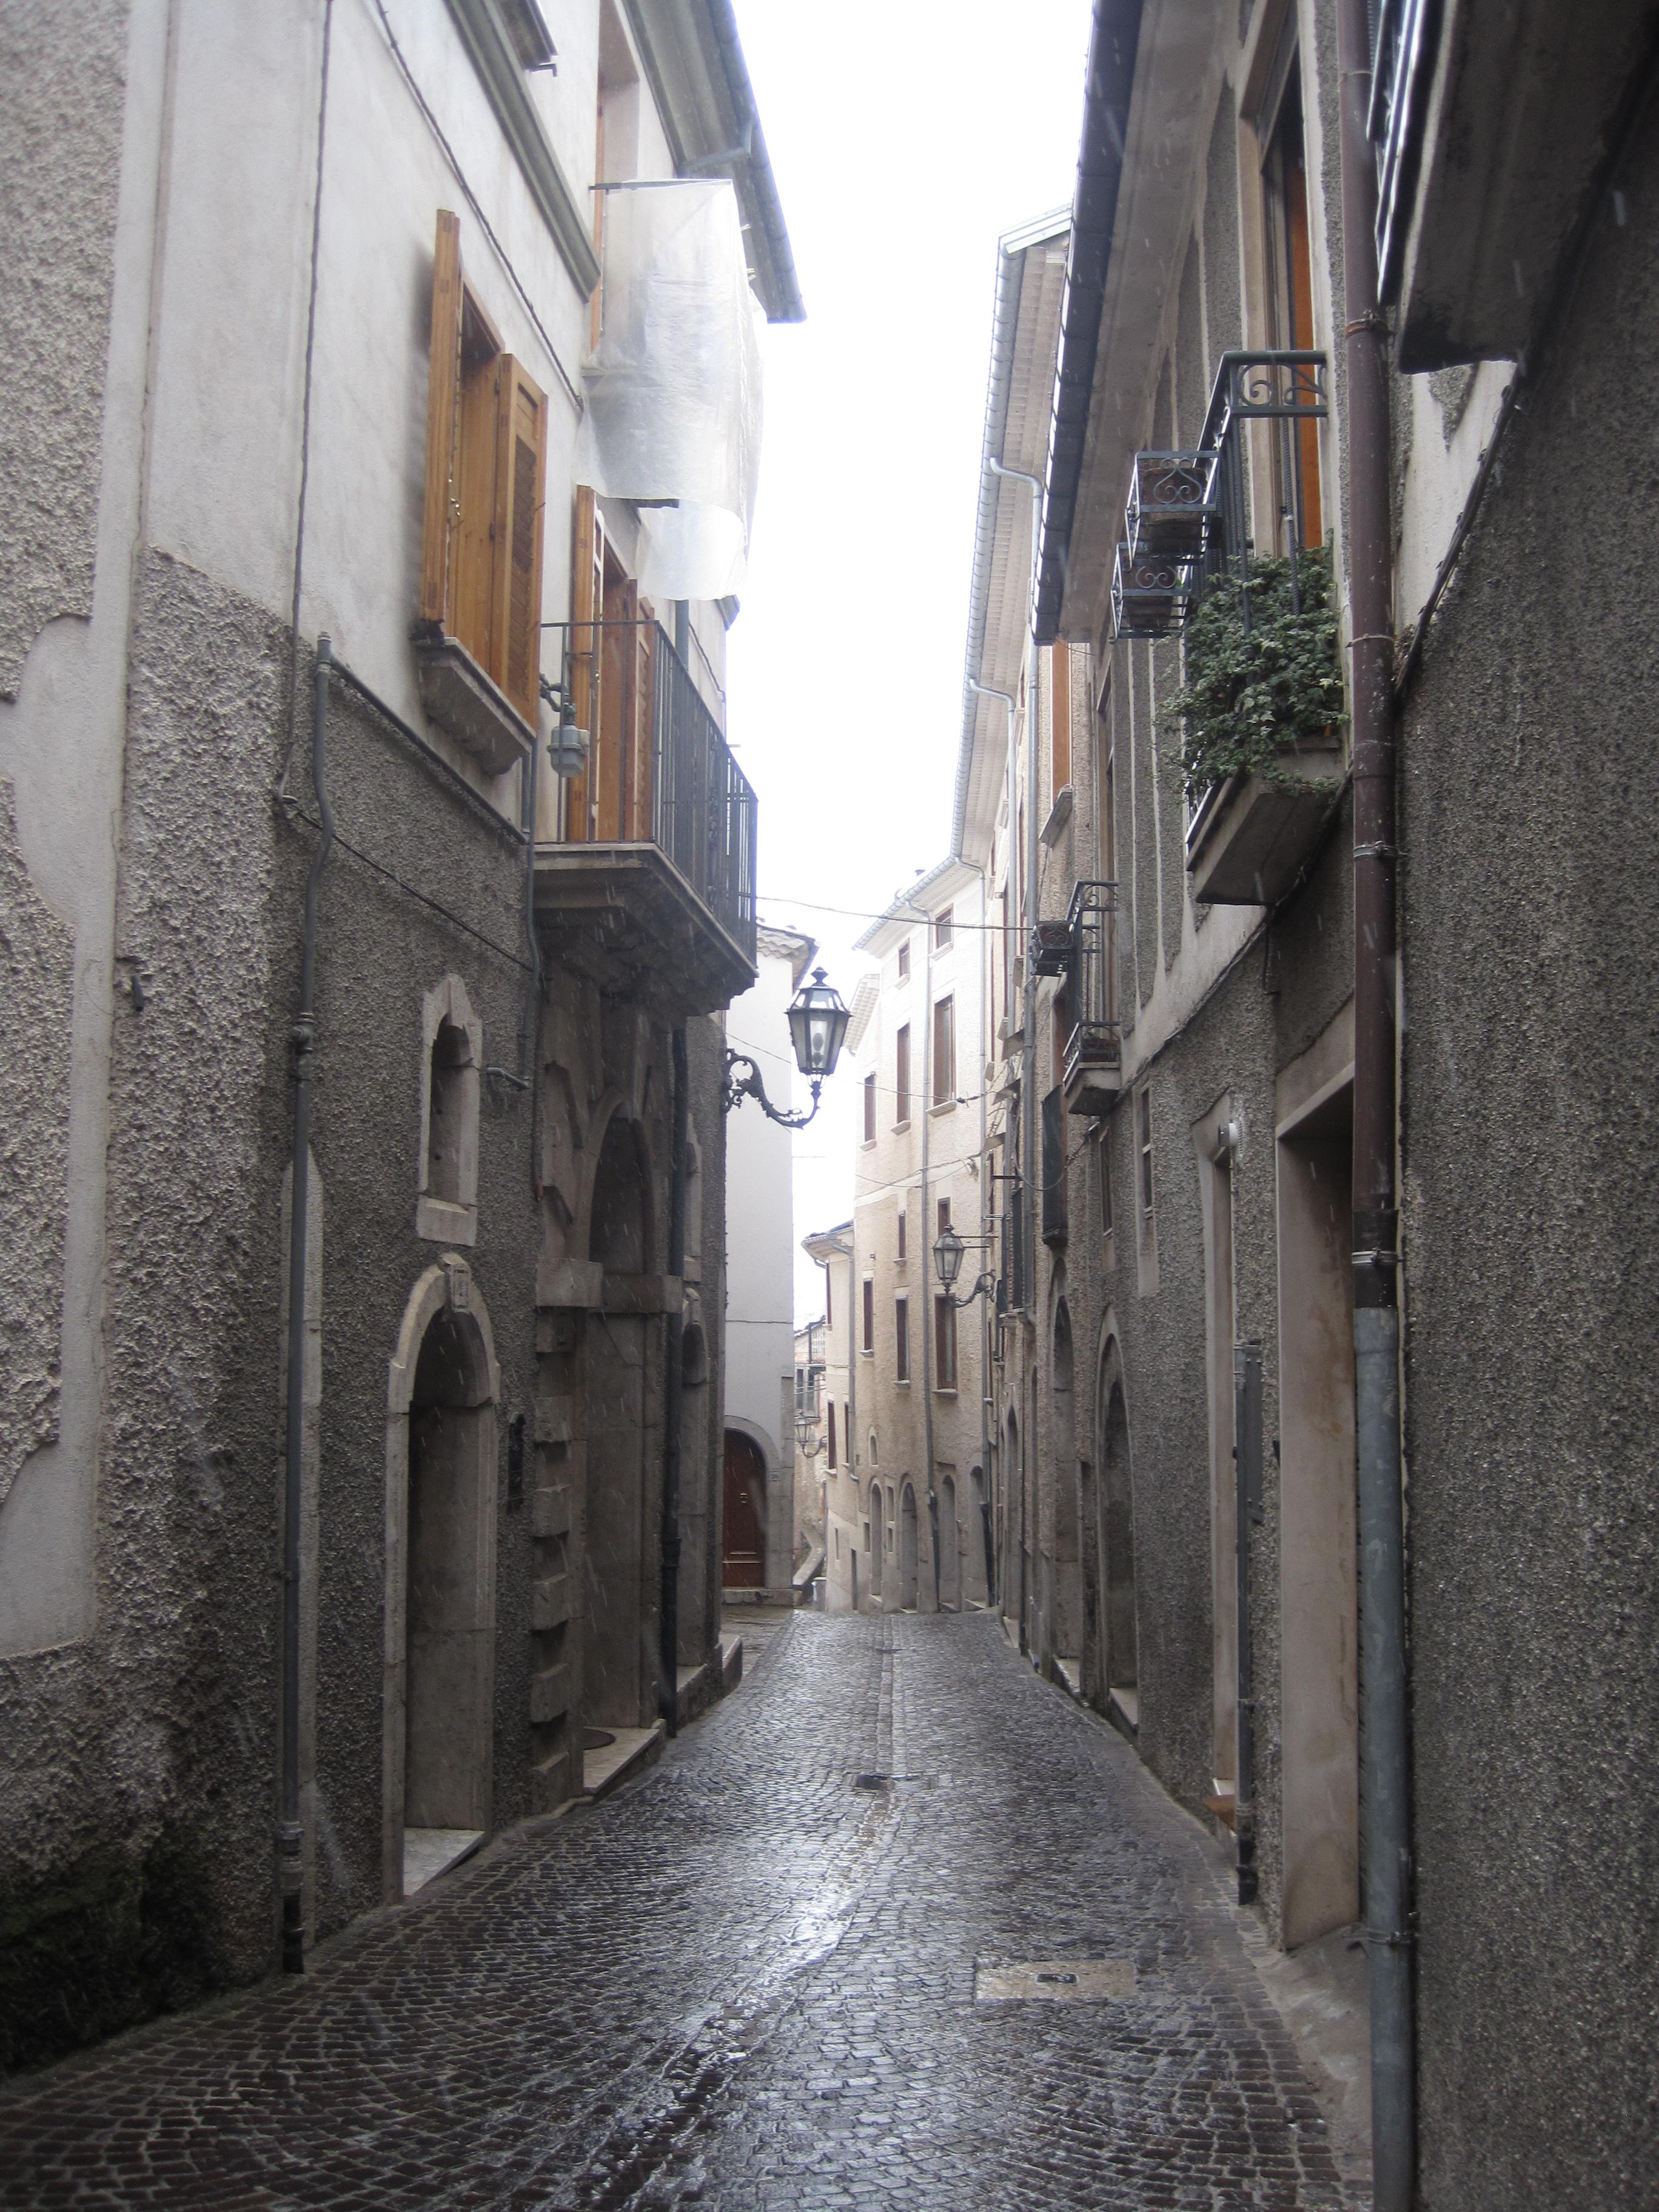 File:Centro Storico Bagnoli Irpino.jpg - Wikimedia Commons